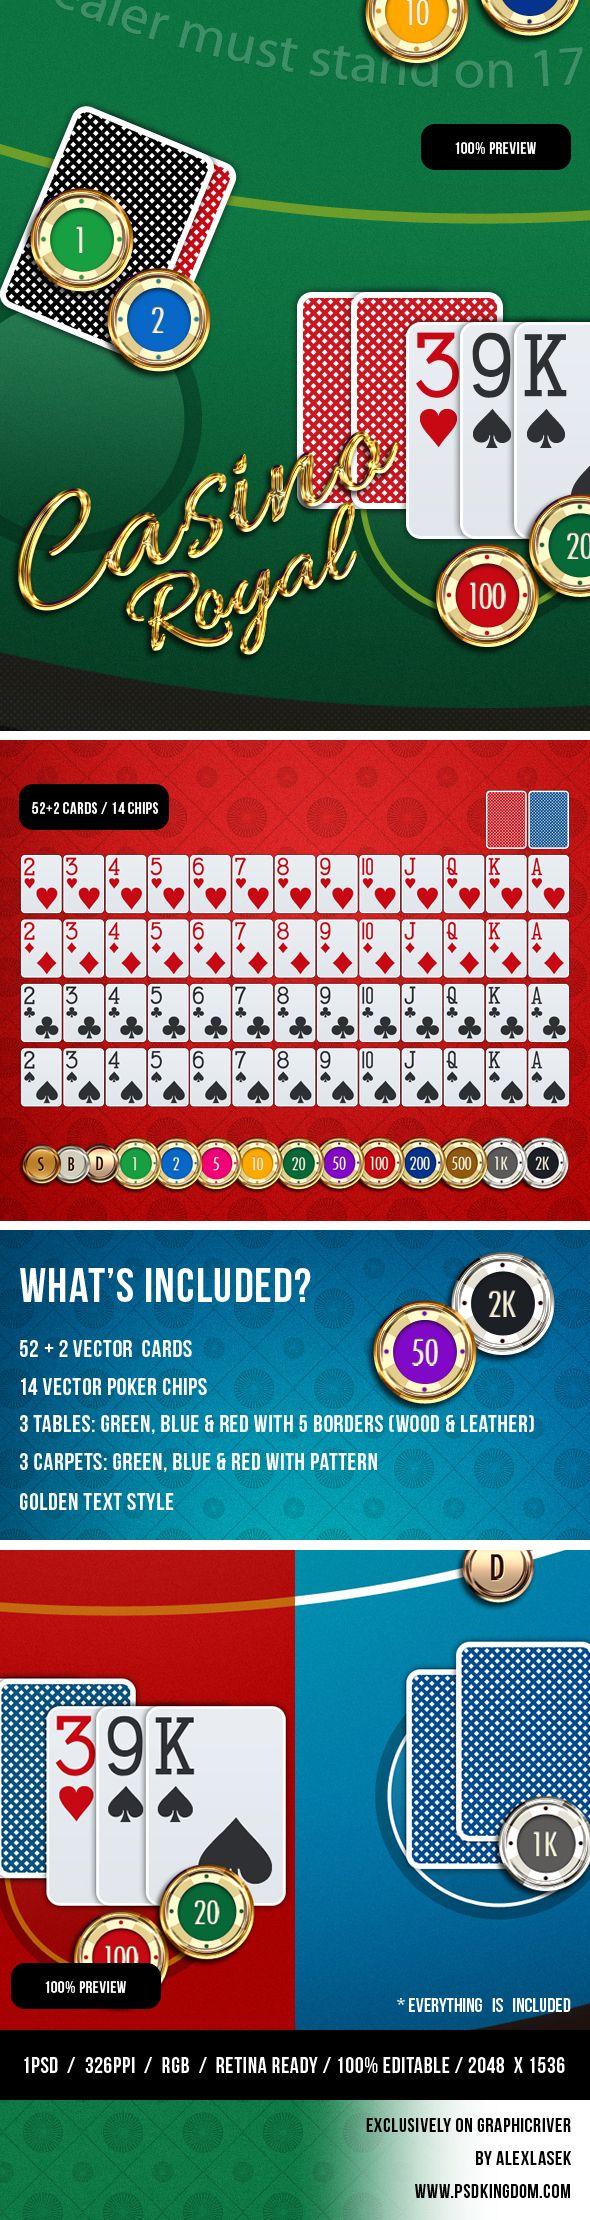 Casino Card Game GUI by Alex Lasek, via Behance